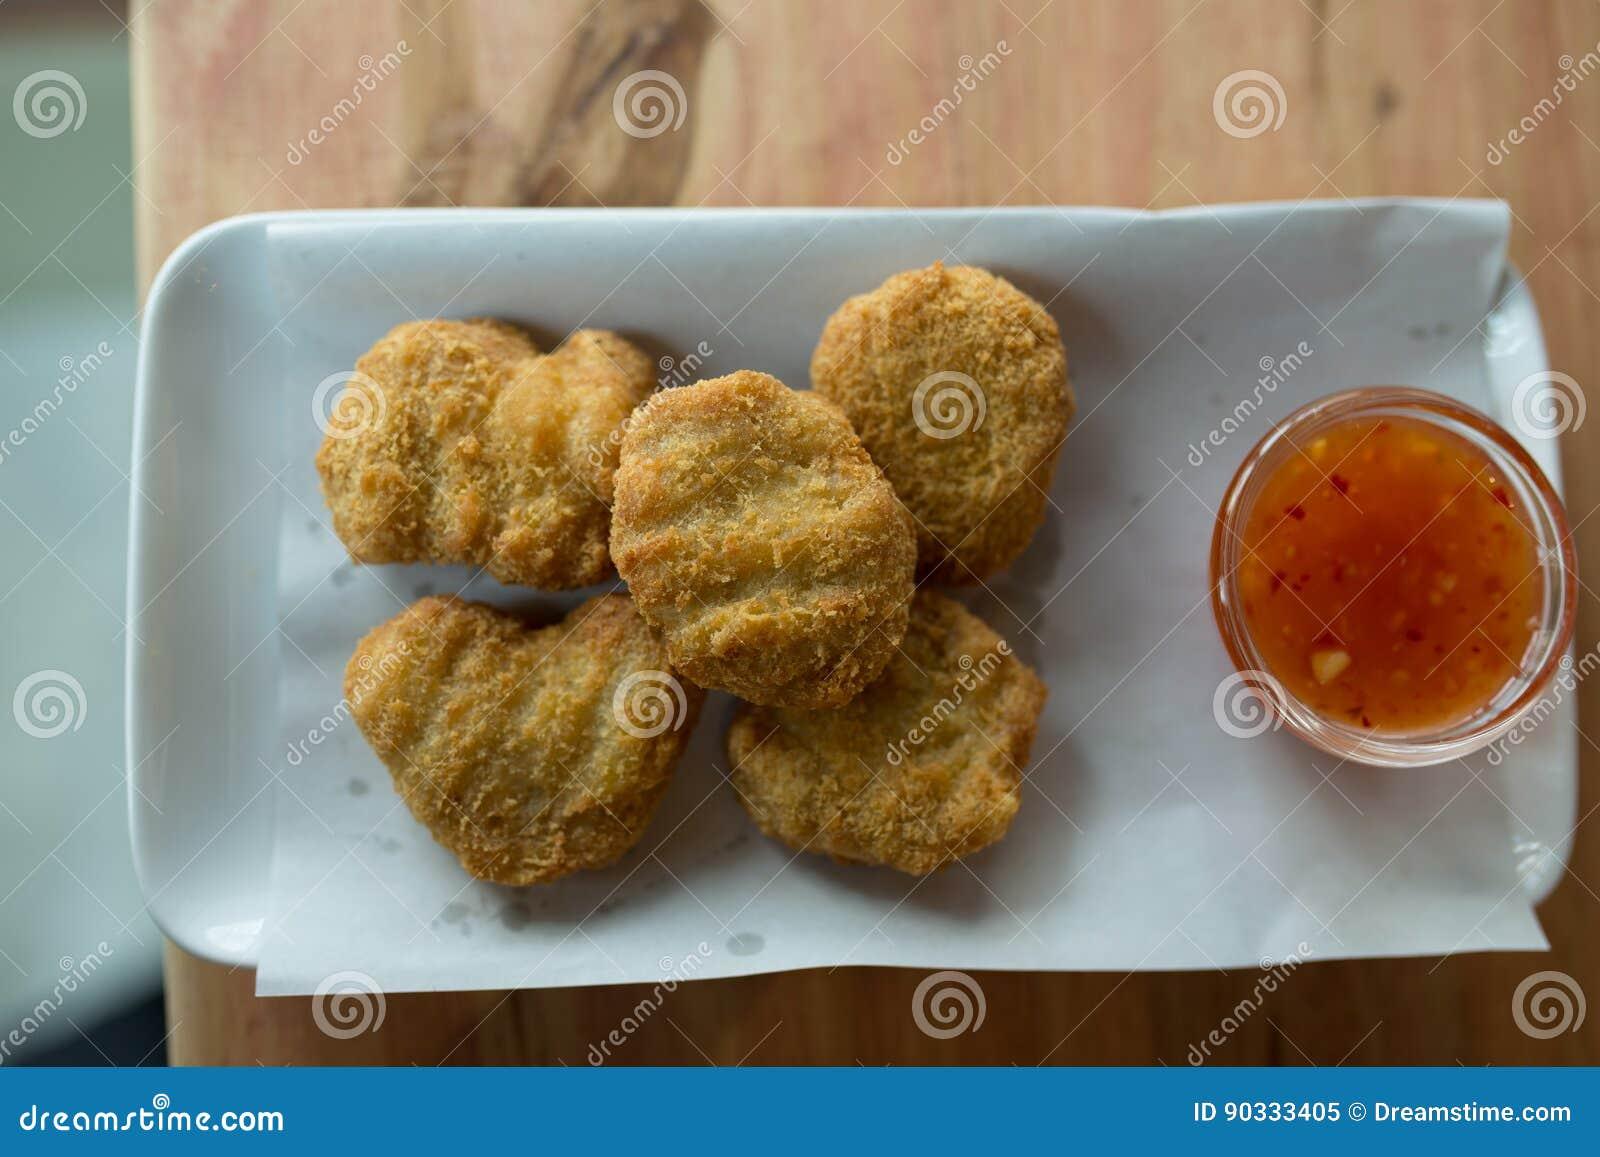 Fried chicken nuggets